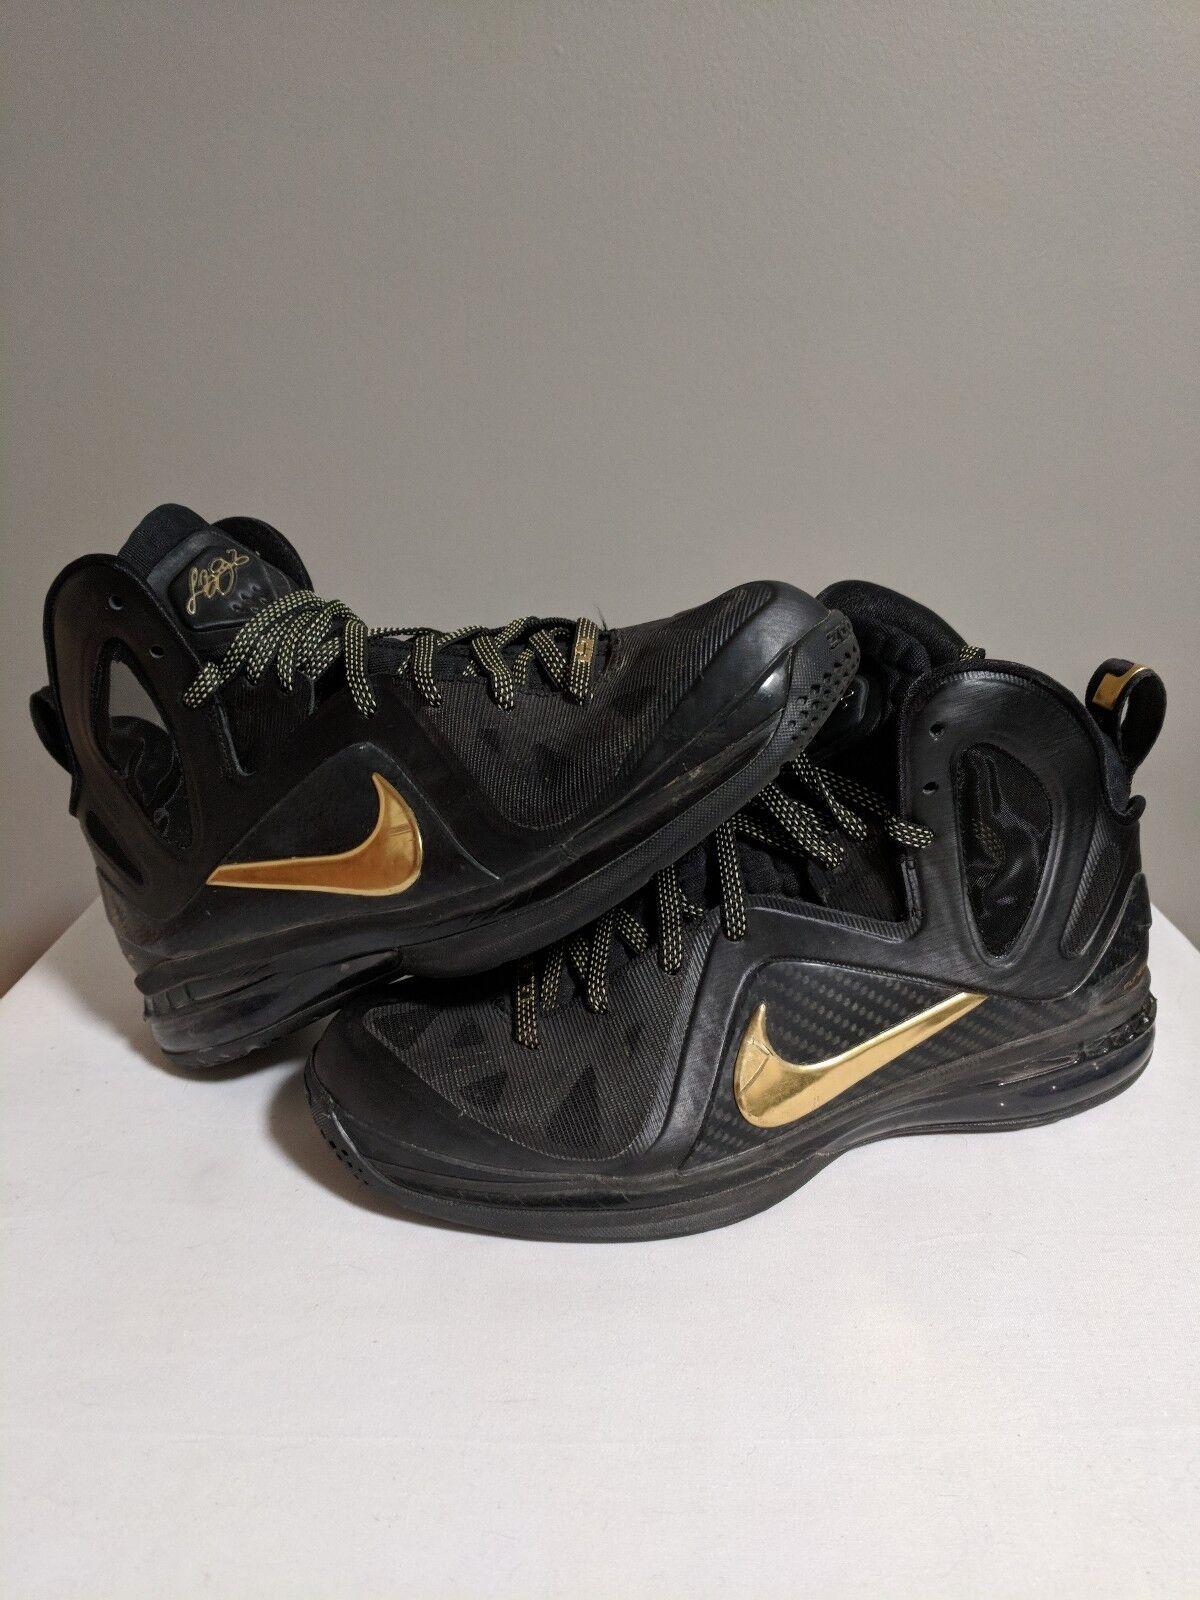 Nike Air Max LEBRON IX 9 9 9 P.S. ELITE PLAYOFF AWAY BLACK gold Size 9 173272